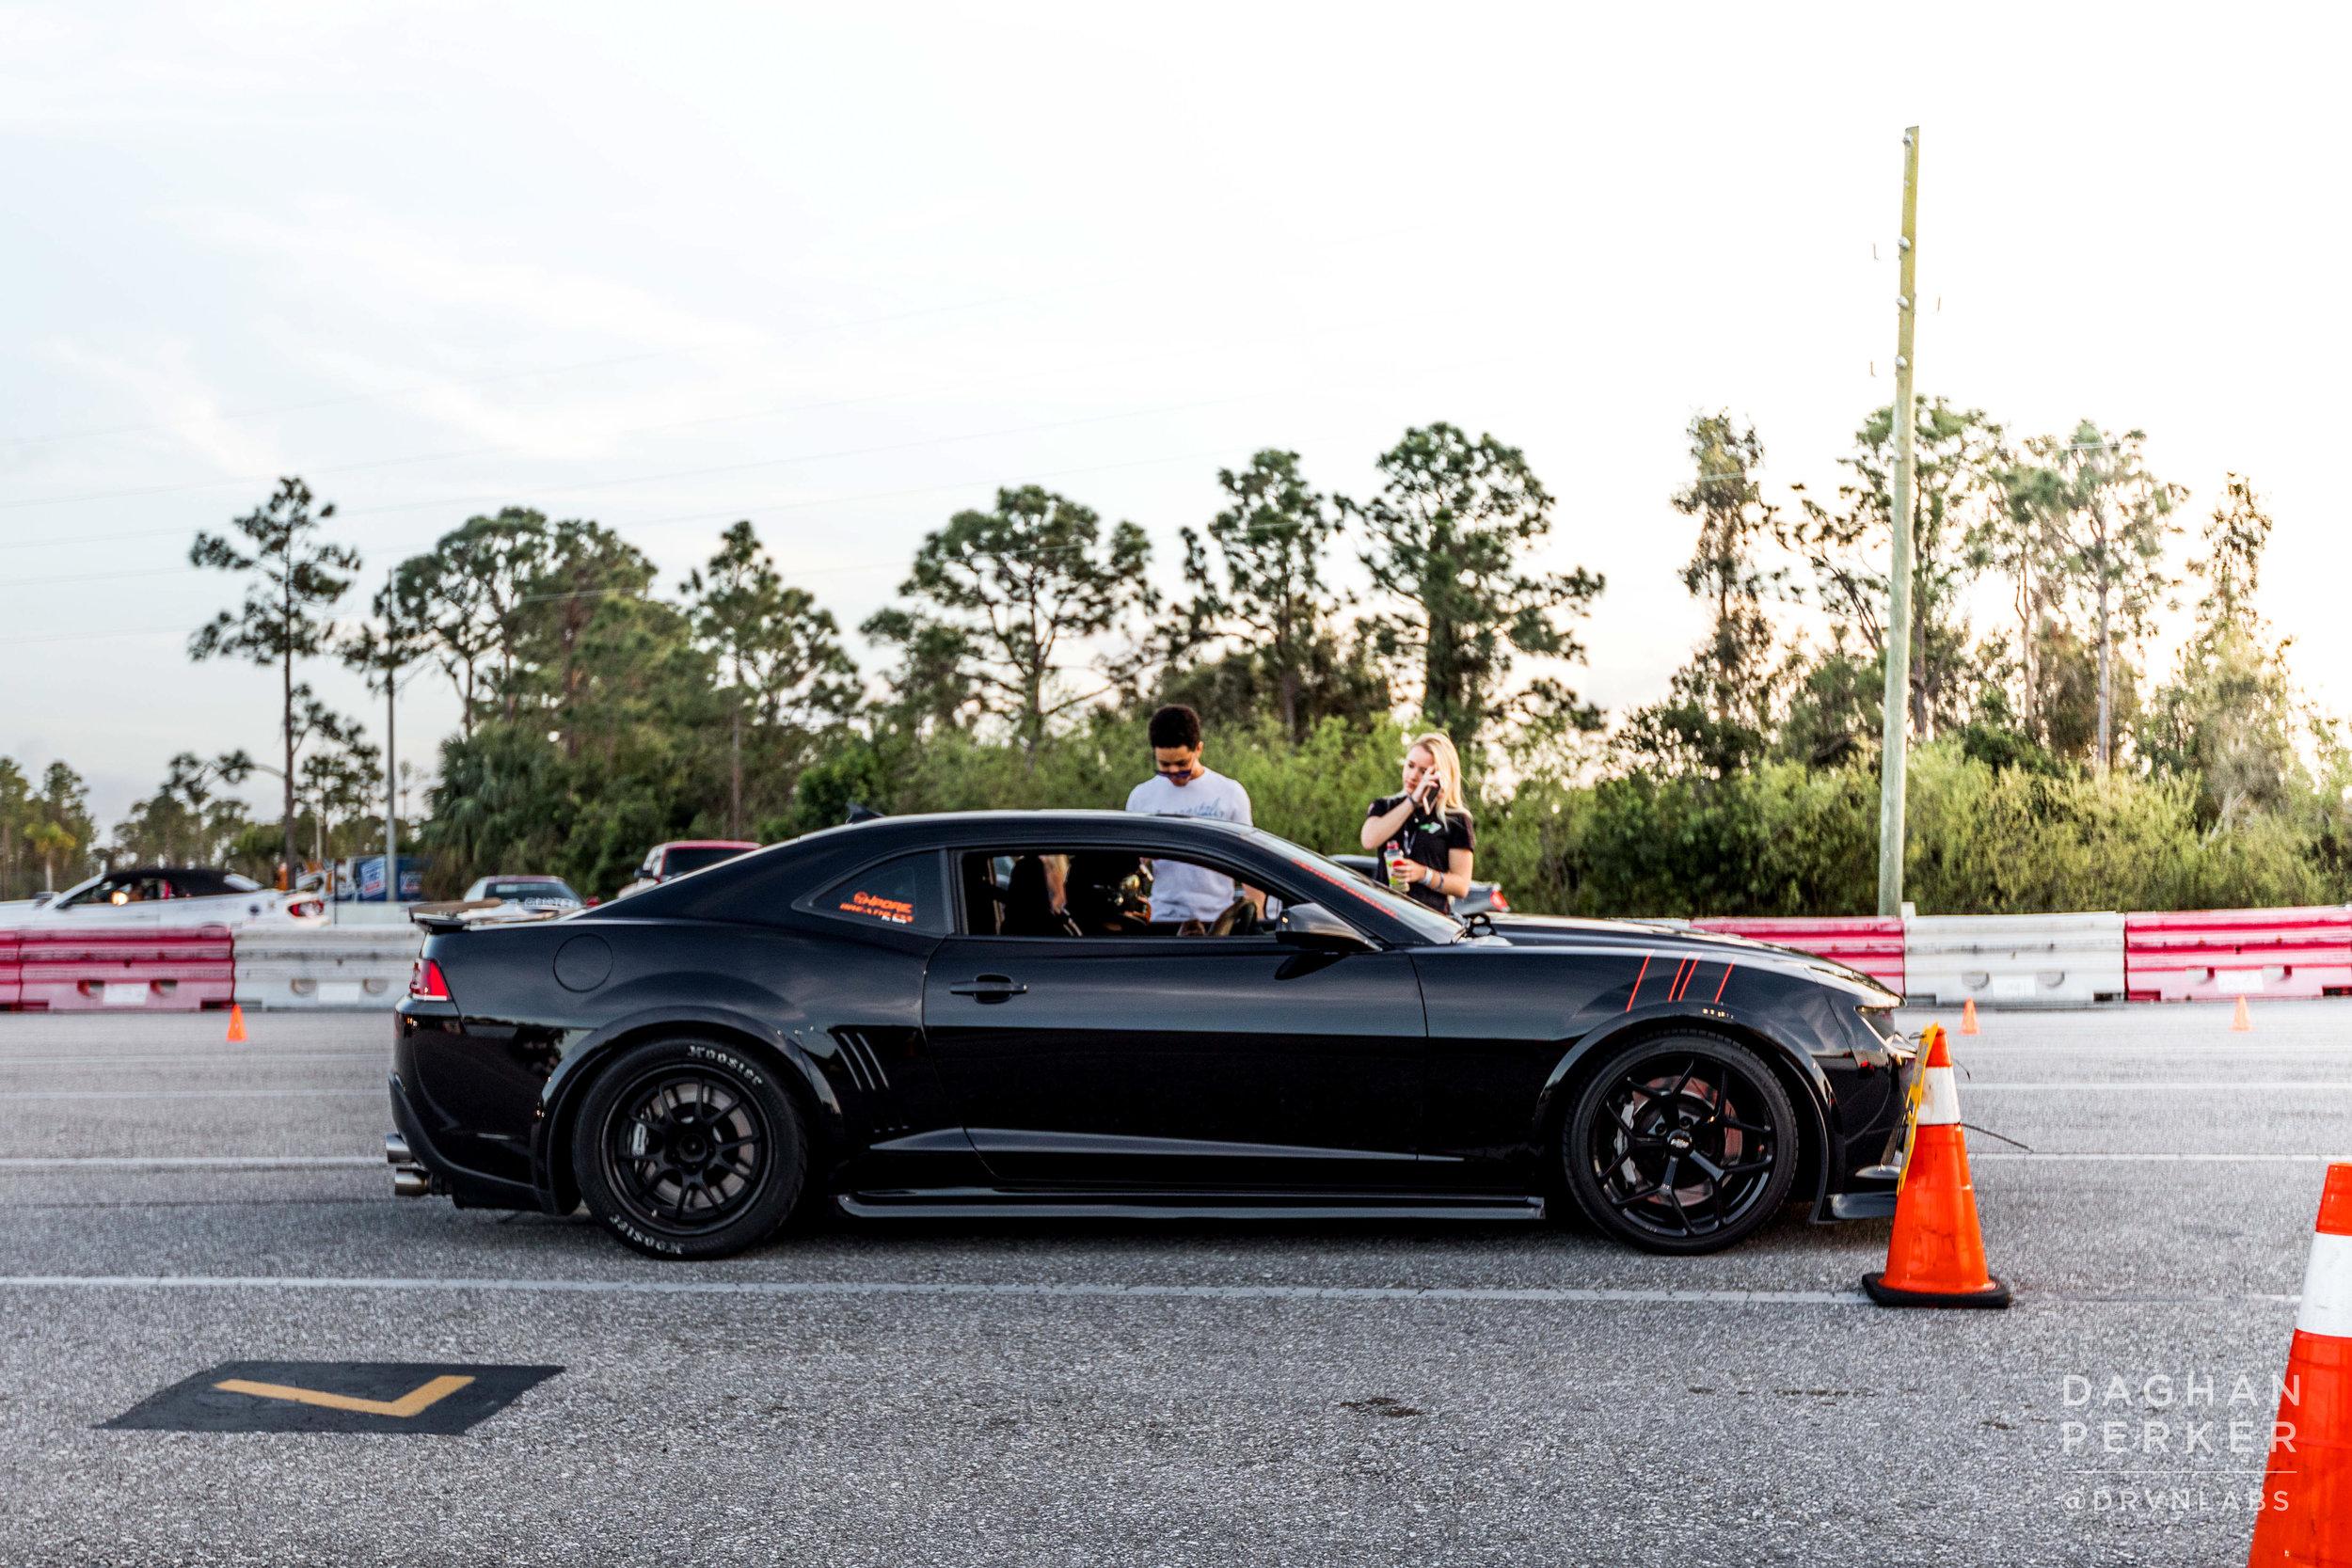 180210-Miami_cars-0434.jpg